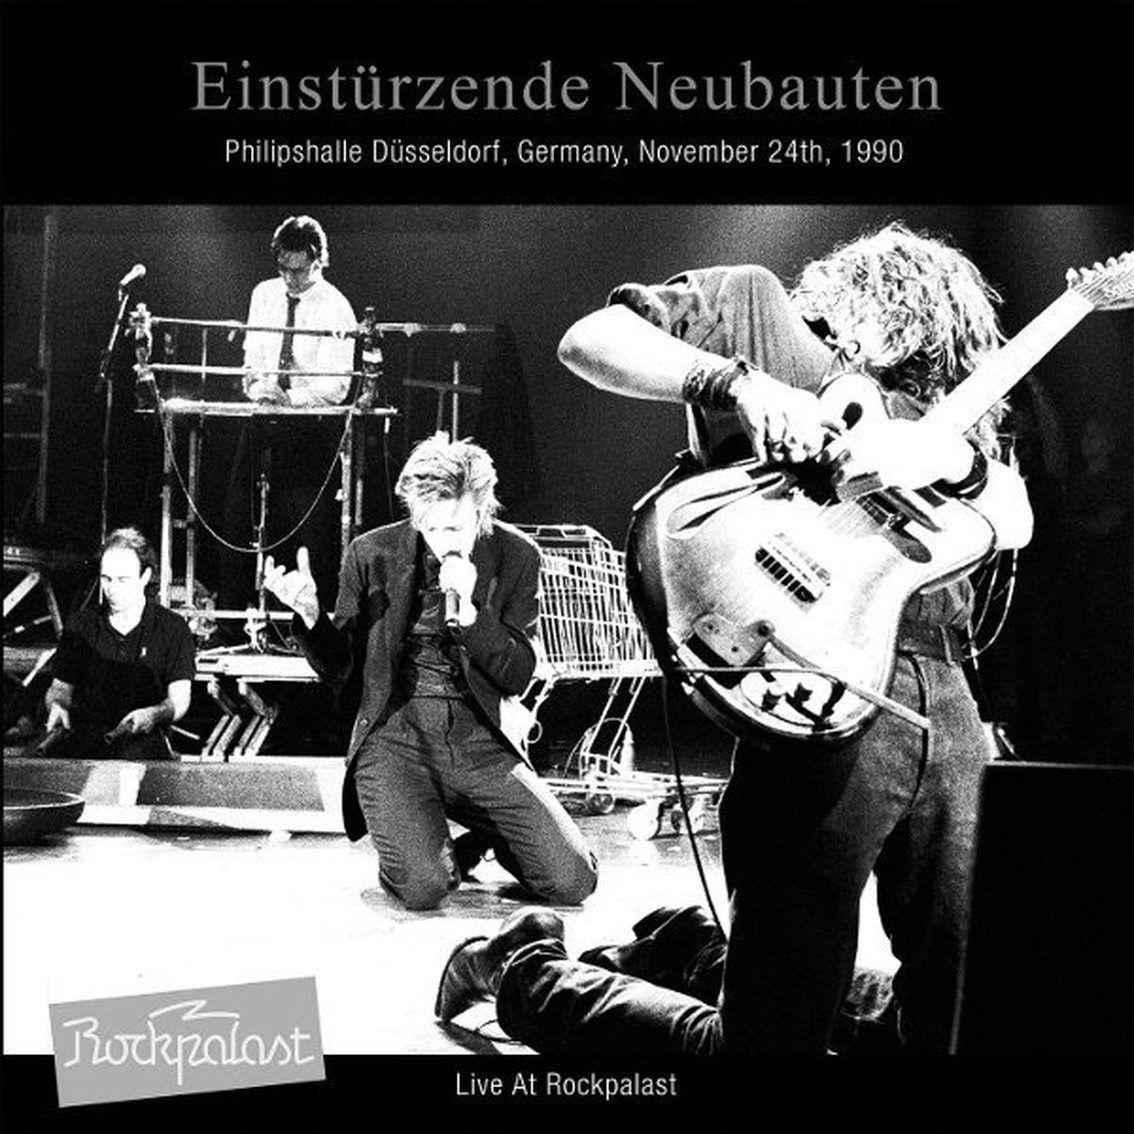 Einsturzende Neubauten finally releases'Live at Rockpalast' 1990 live album as deluxe 2LP set - order here